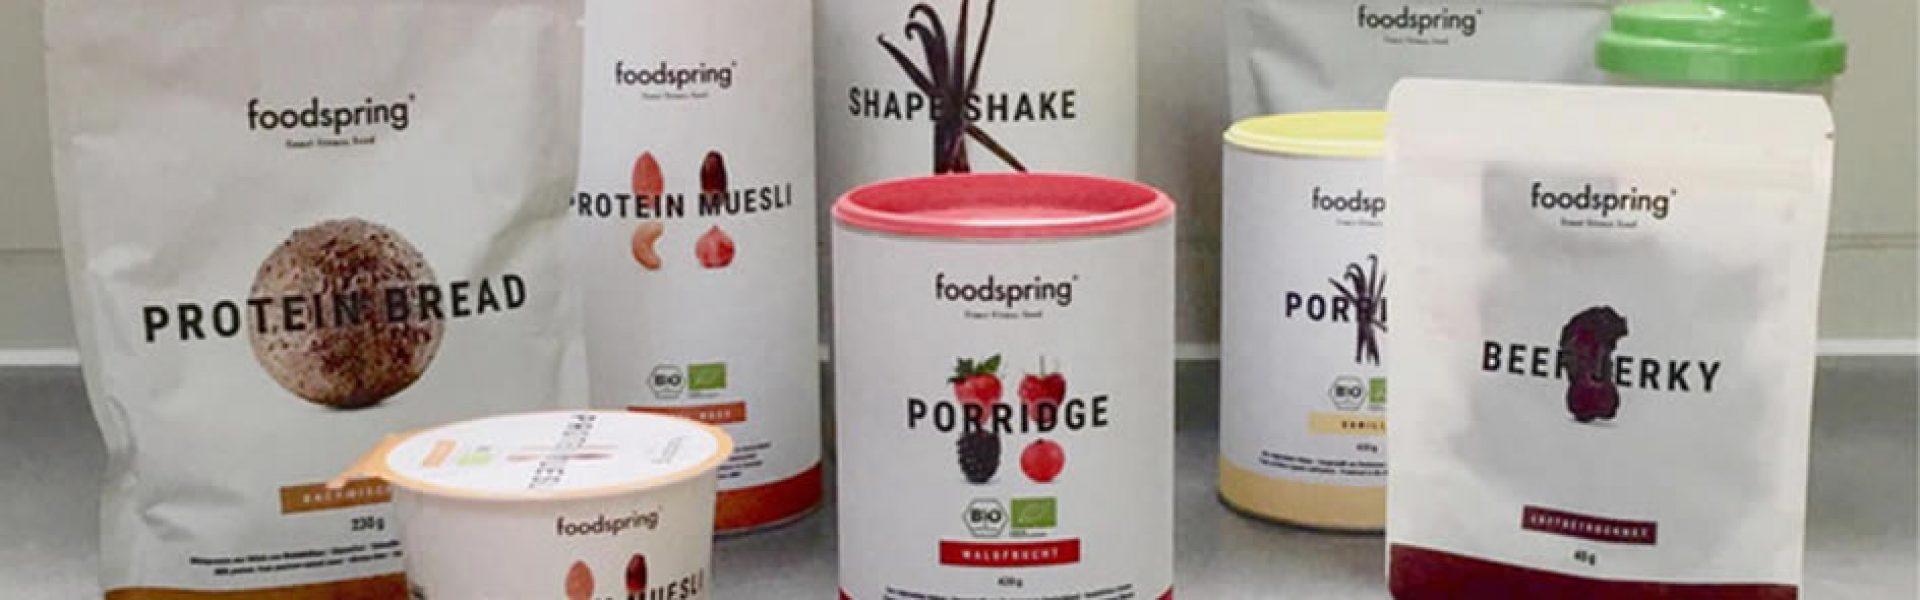 foodspring perte de poids avant apres